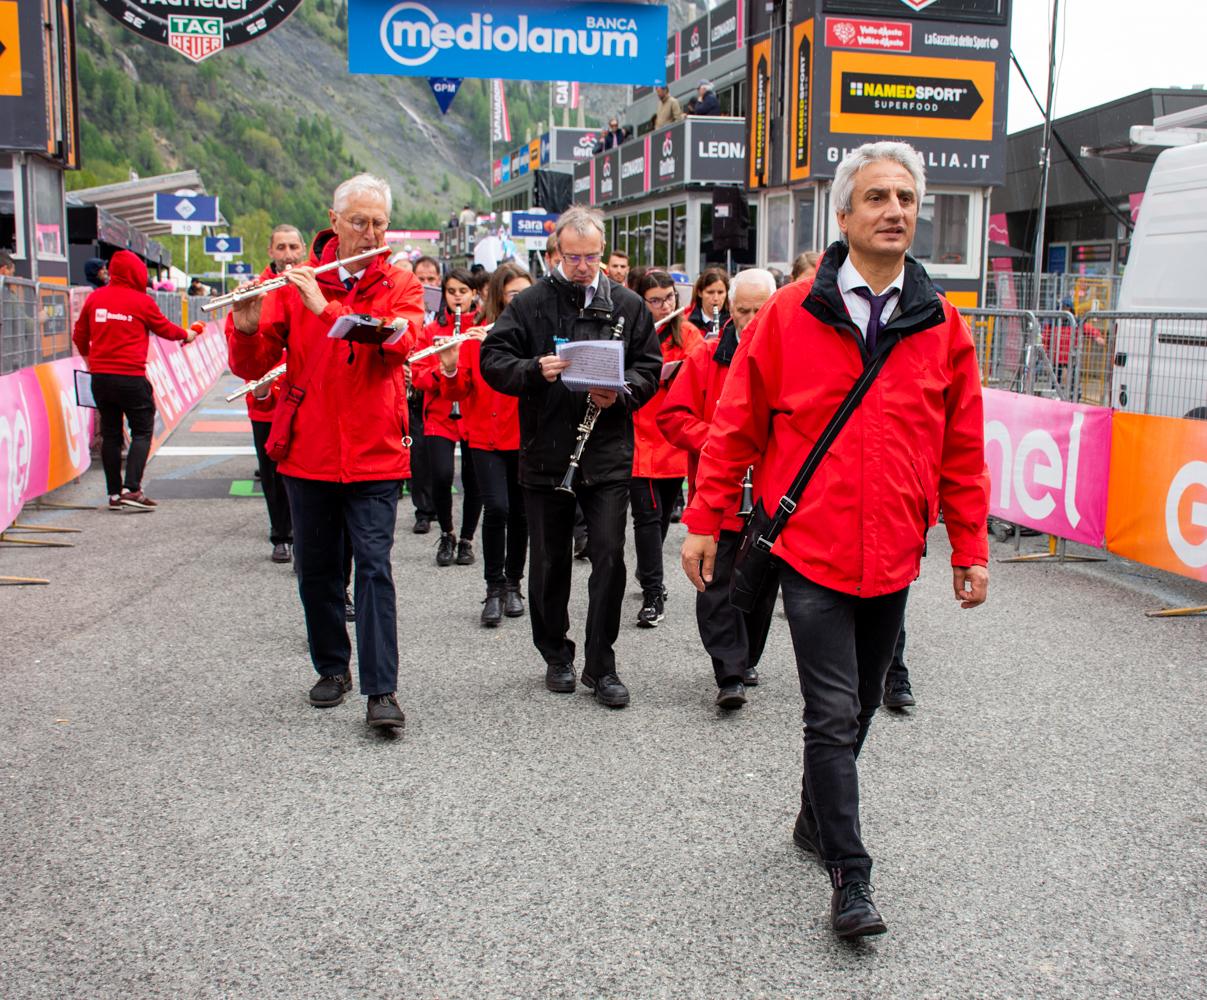 Giro dItalia Foto di Matteo Atzori Pennard